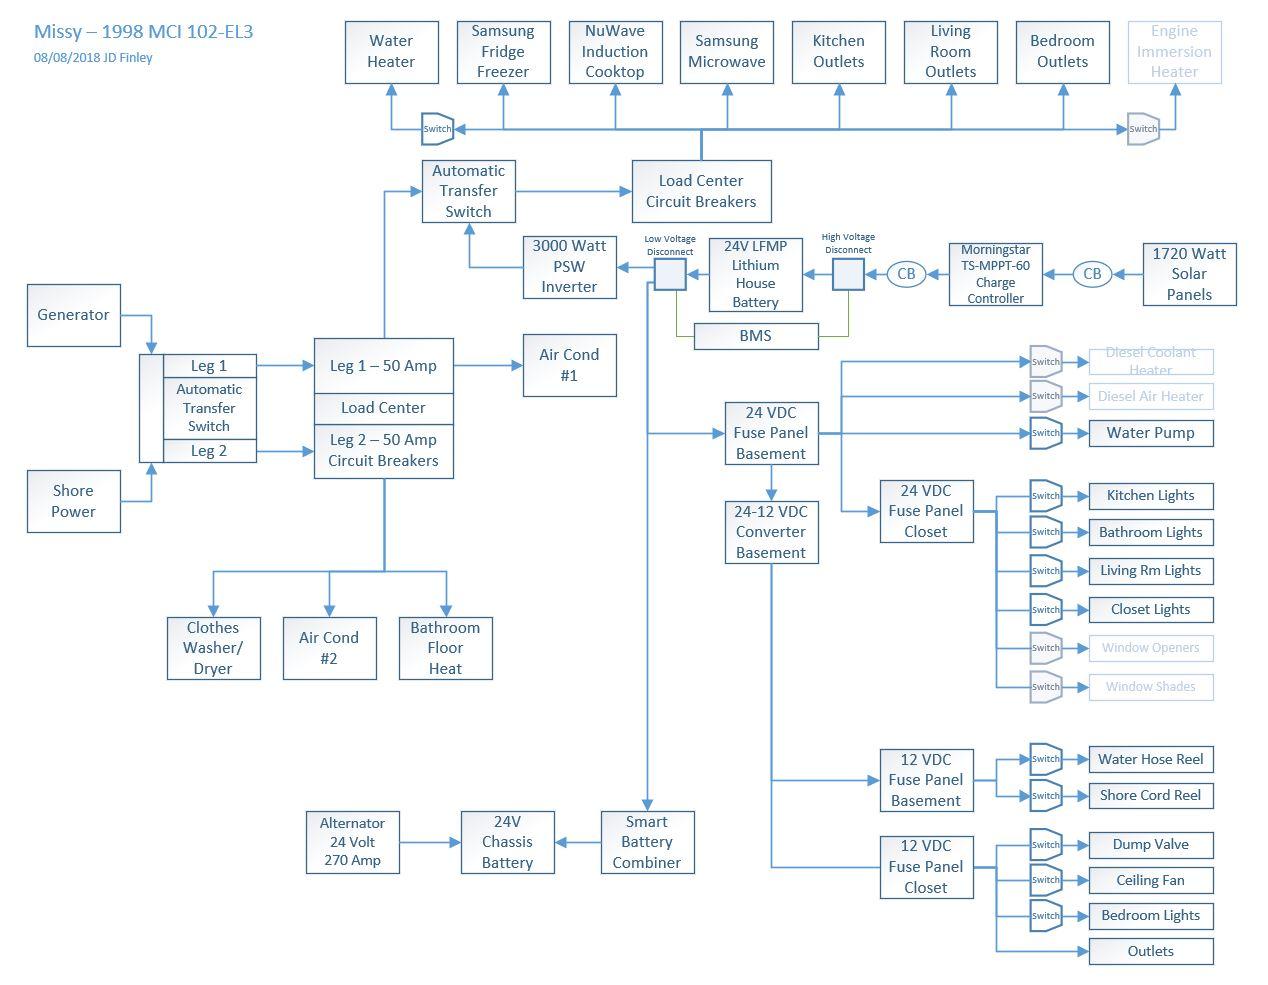 Electrical System Design Jdfinley Com